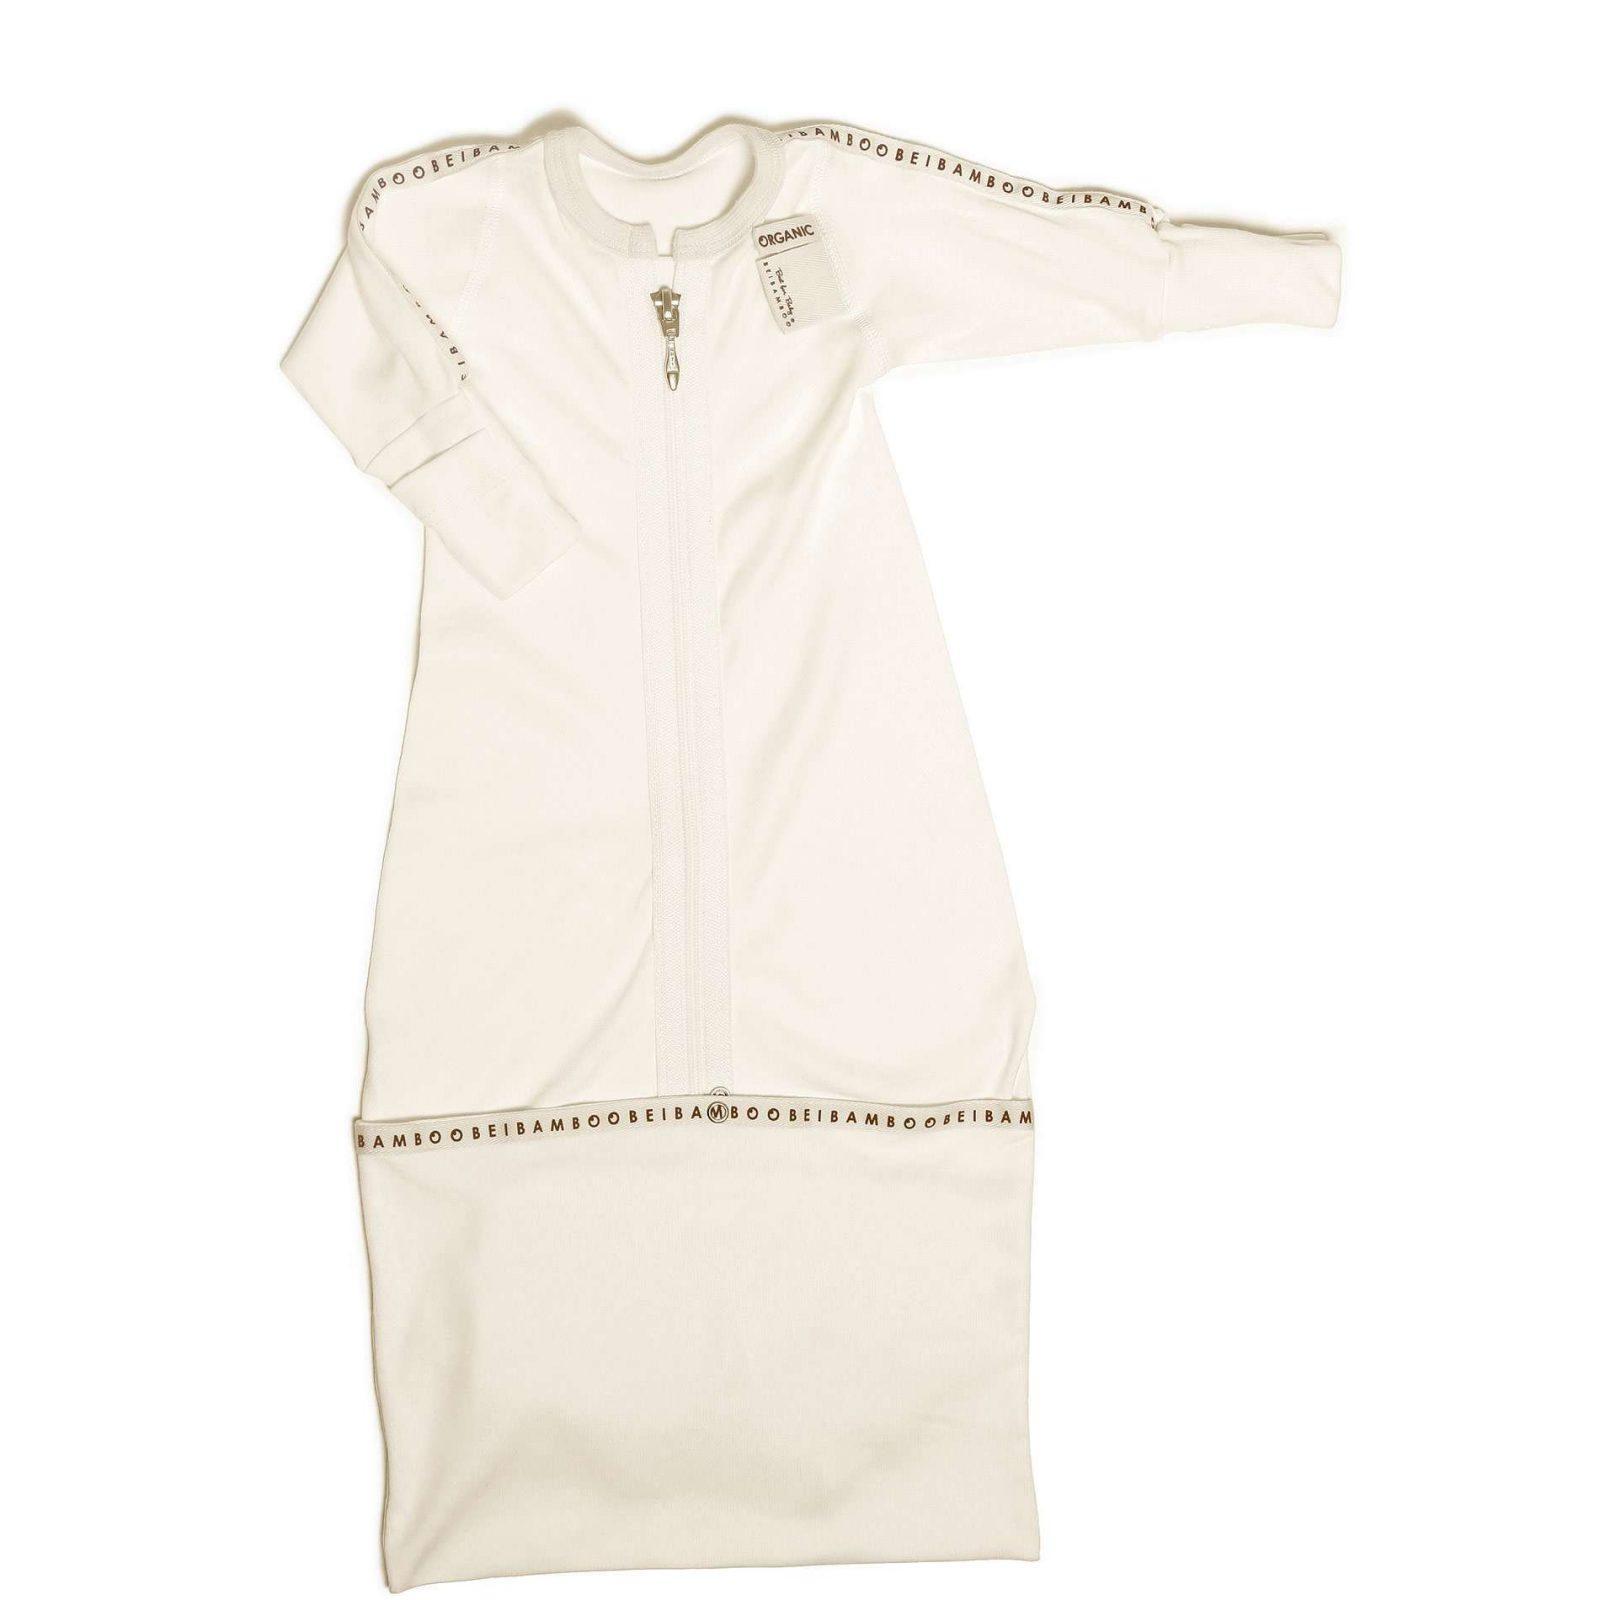 Sleep-pod White for newborn baby